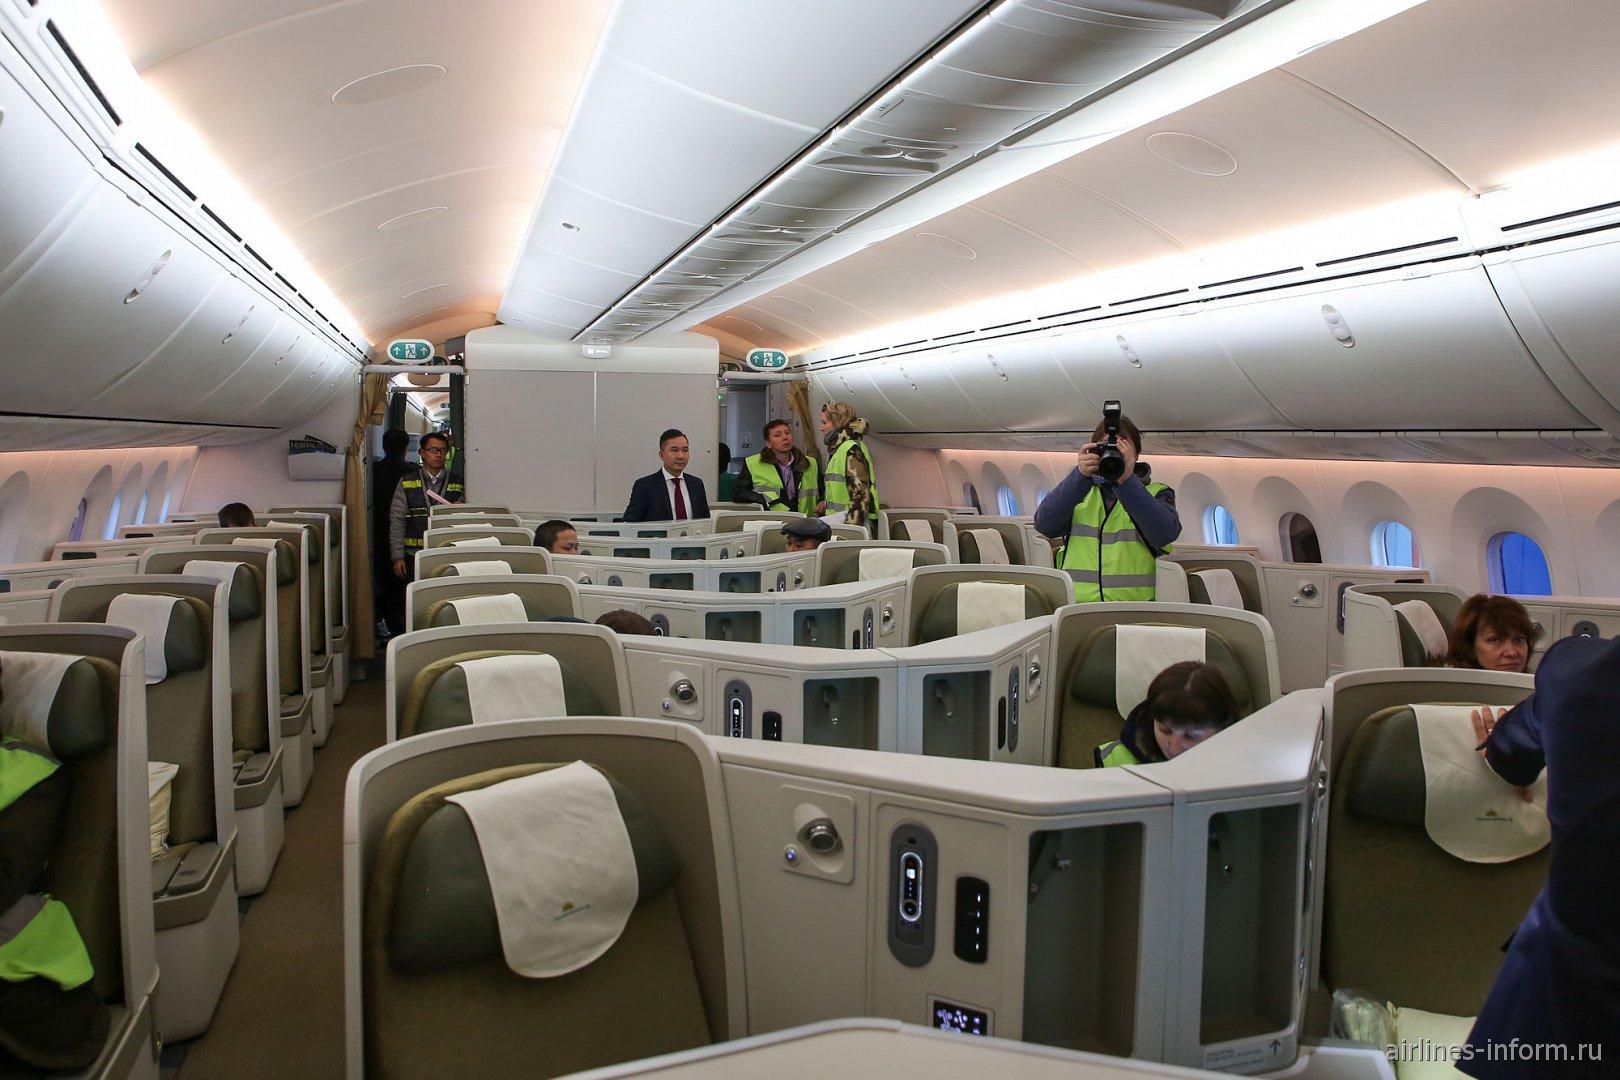 Пассажирский салон бизнес-класса в Боинге-787-9 Вьетнамских авиалиний